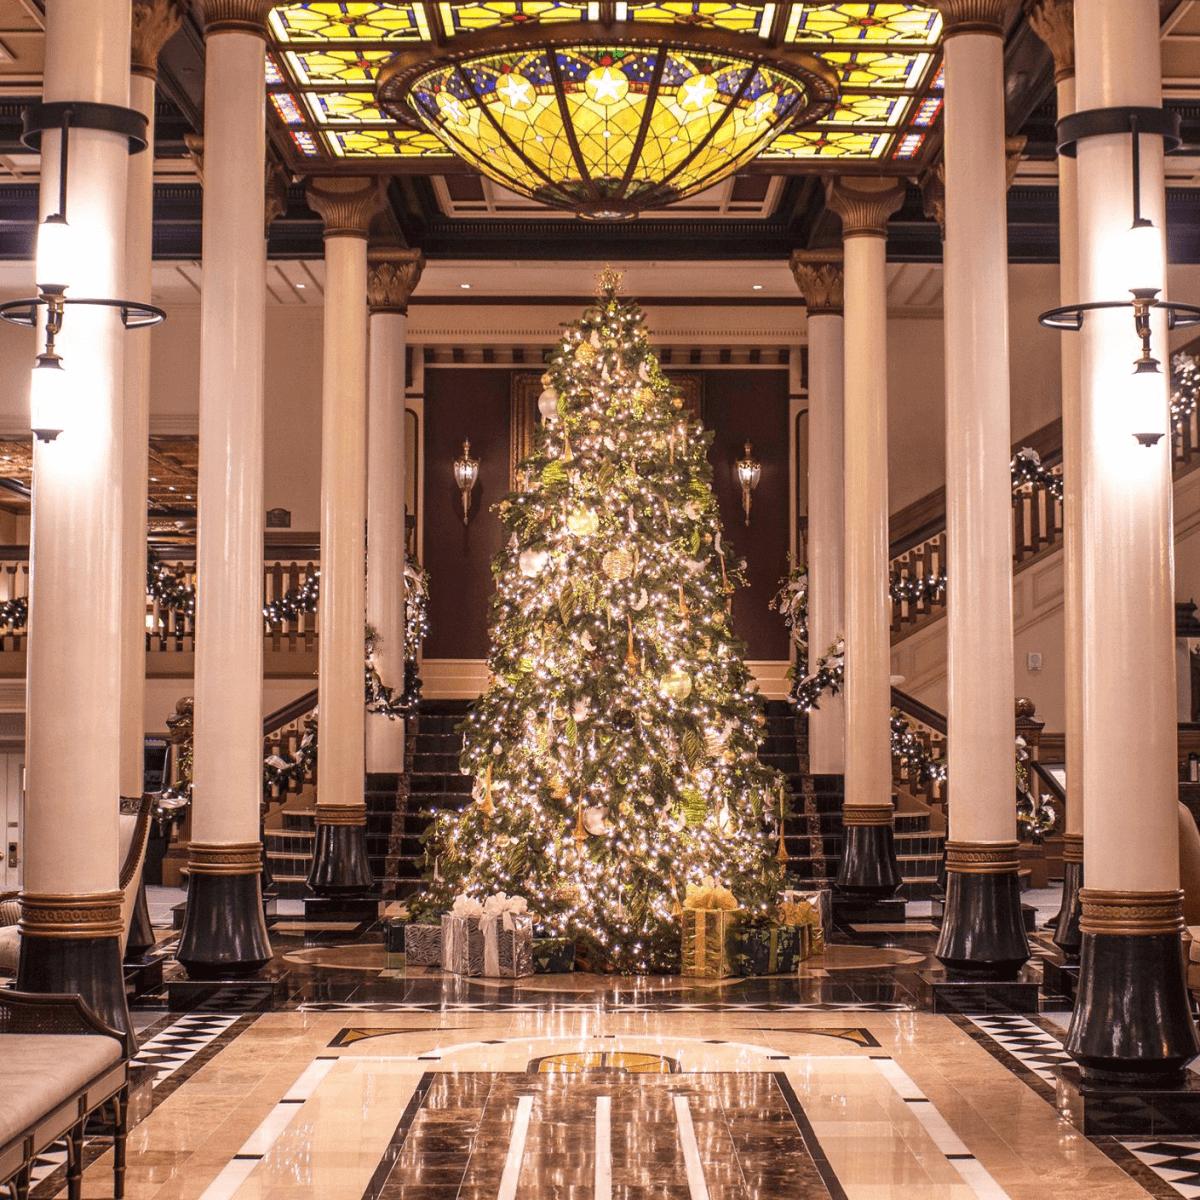 driskill hotel austin christmas tree lobby - Is Whataburger Open On Christmas Day